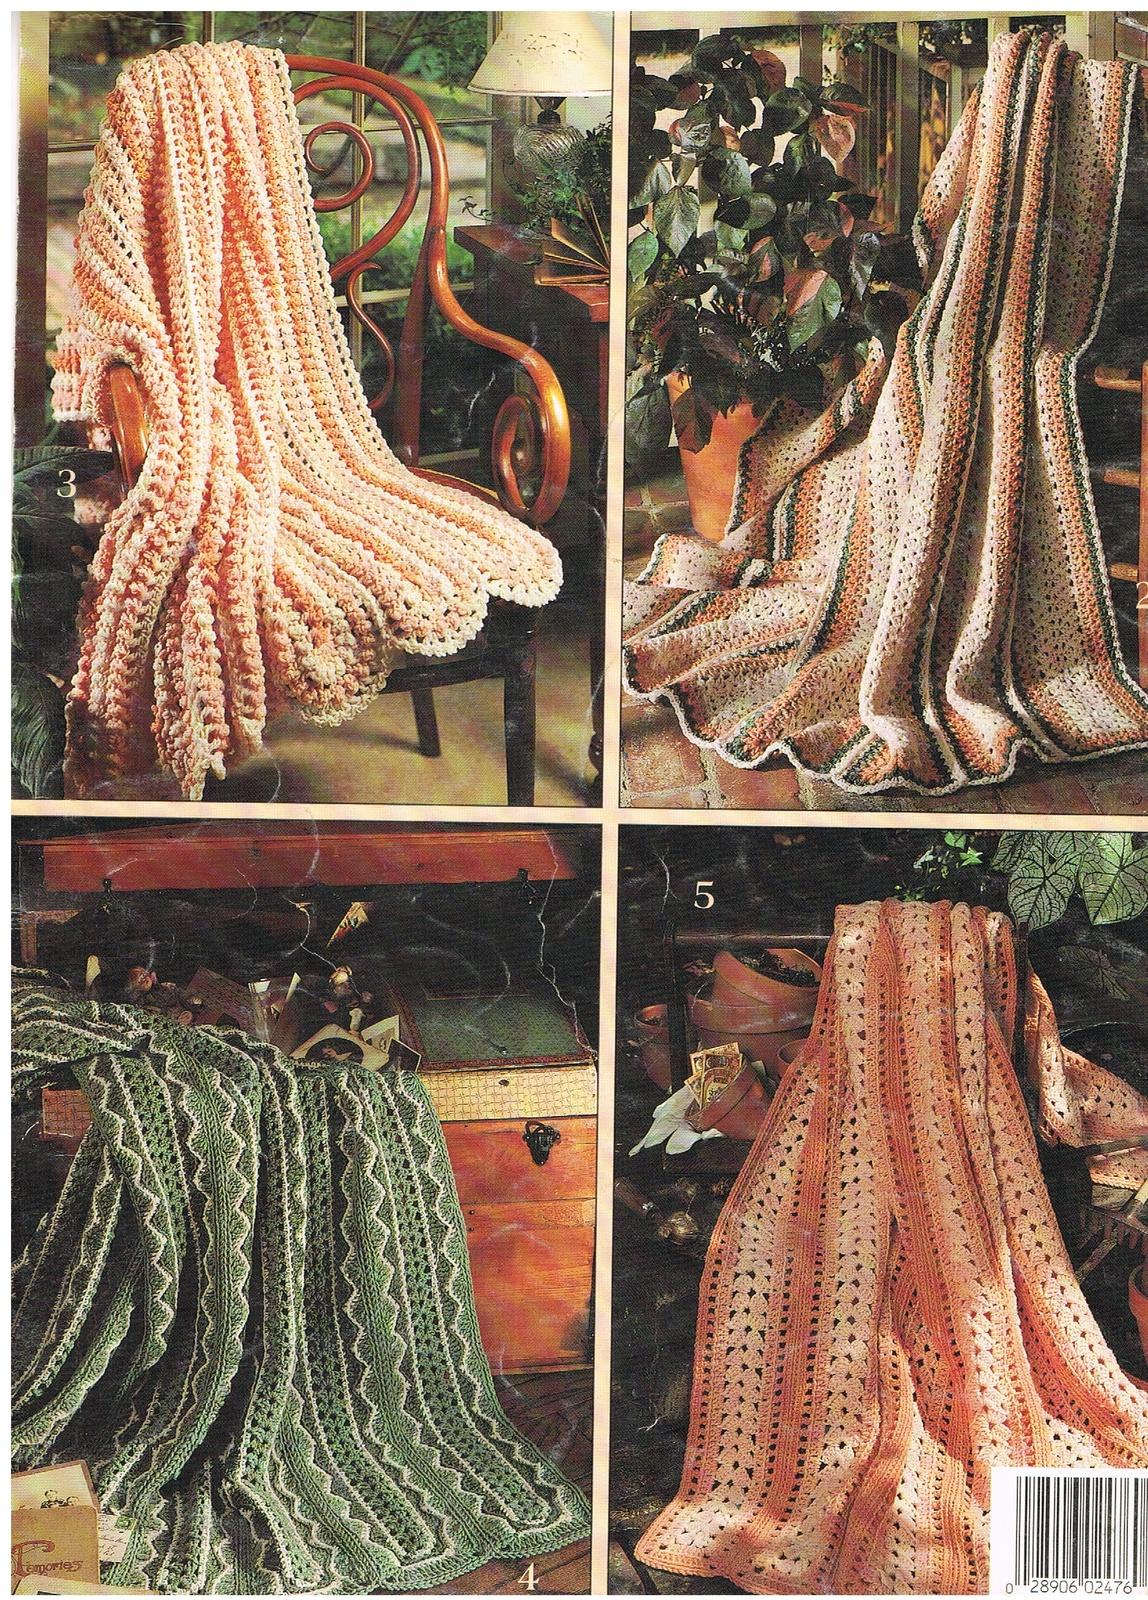 Afghan Crochet /& Knitting Pattern Booklets Leisure Arts Brunswick Columbia